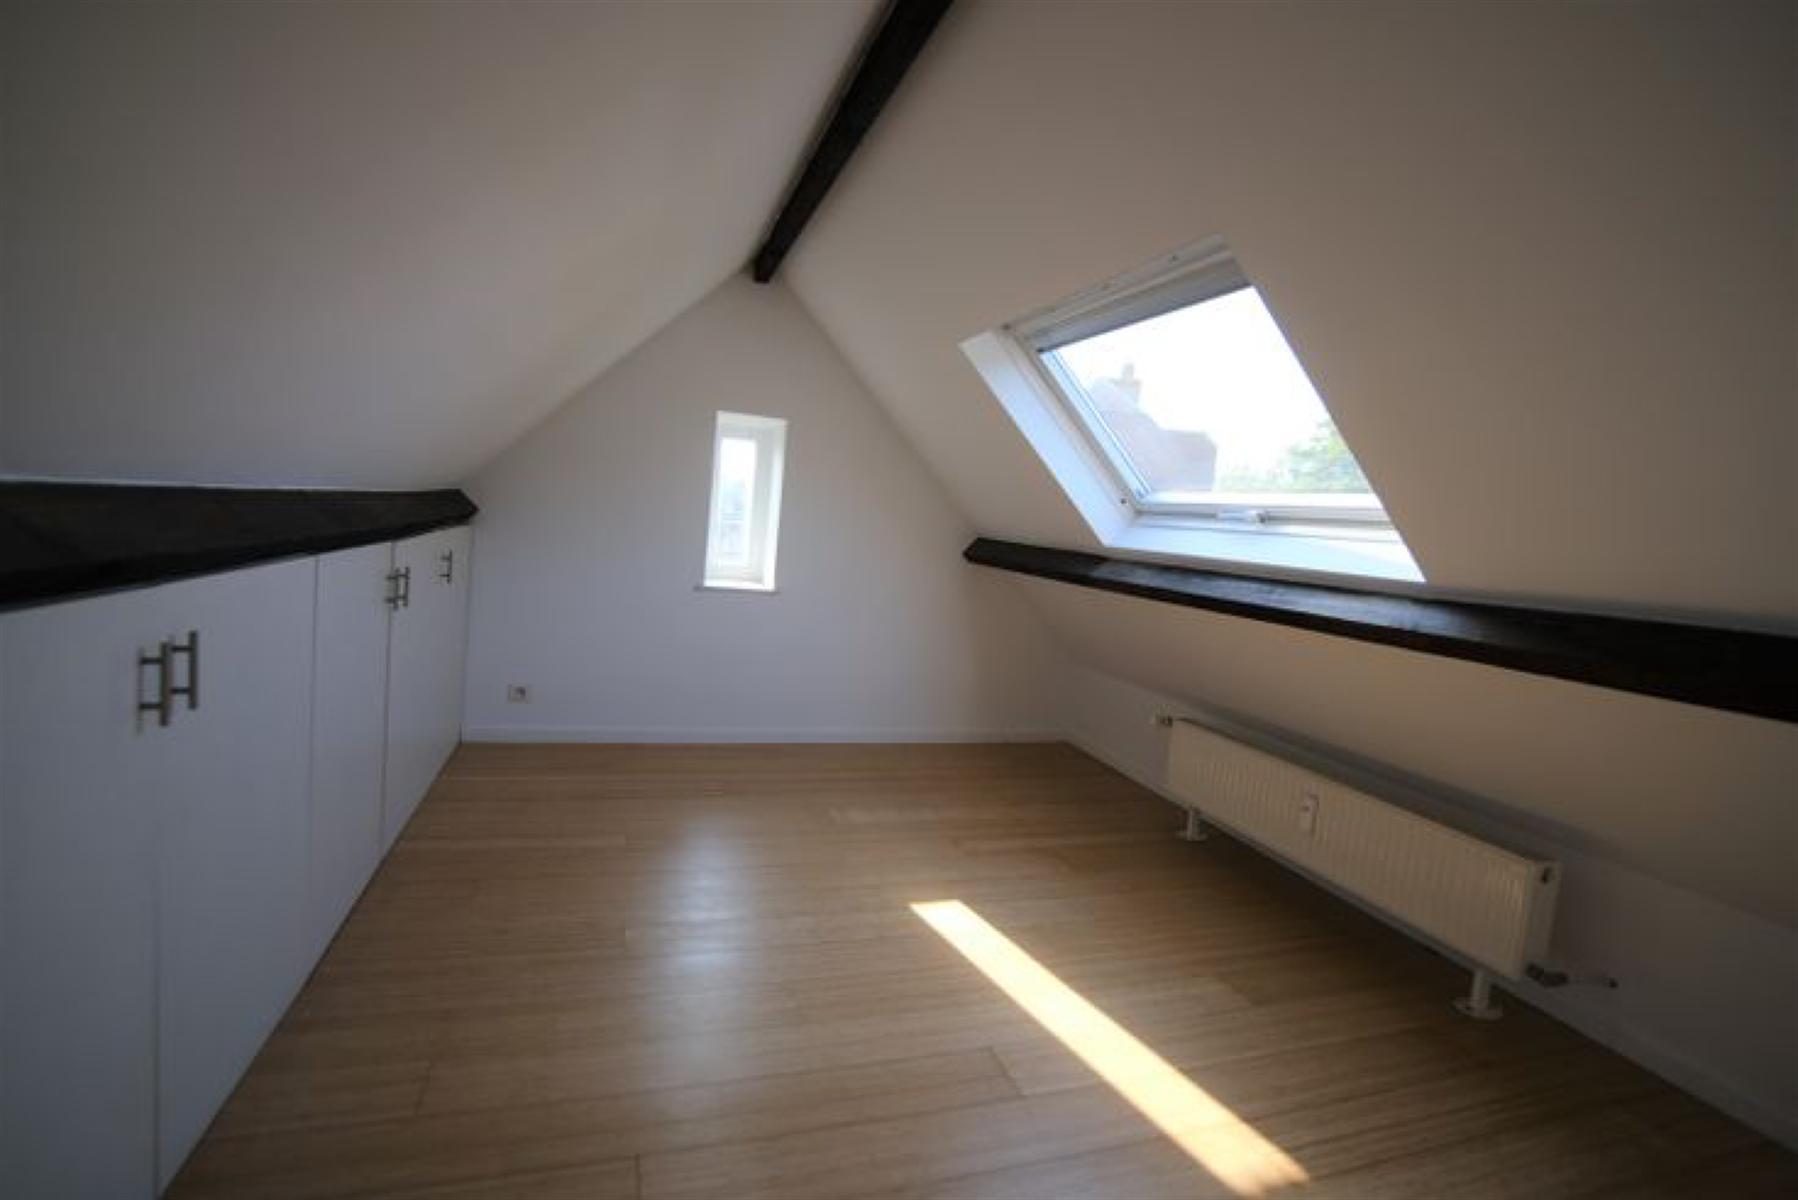 Flat - Auderghem - #4520709-15